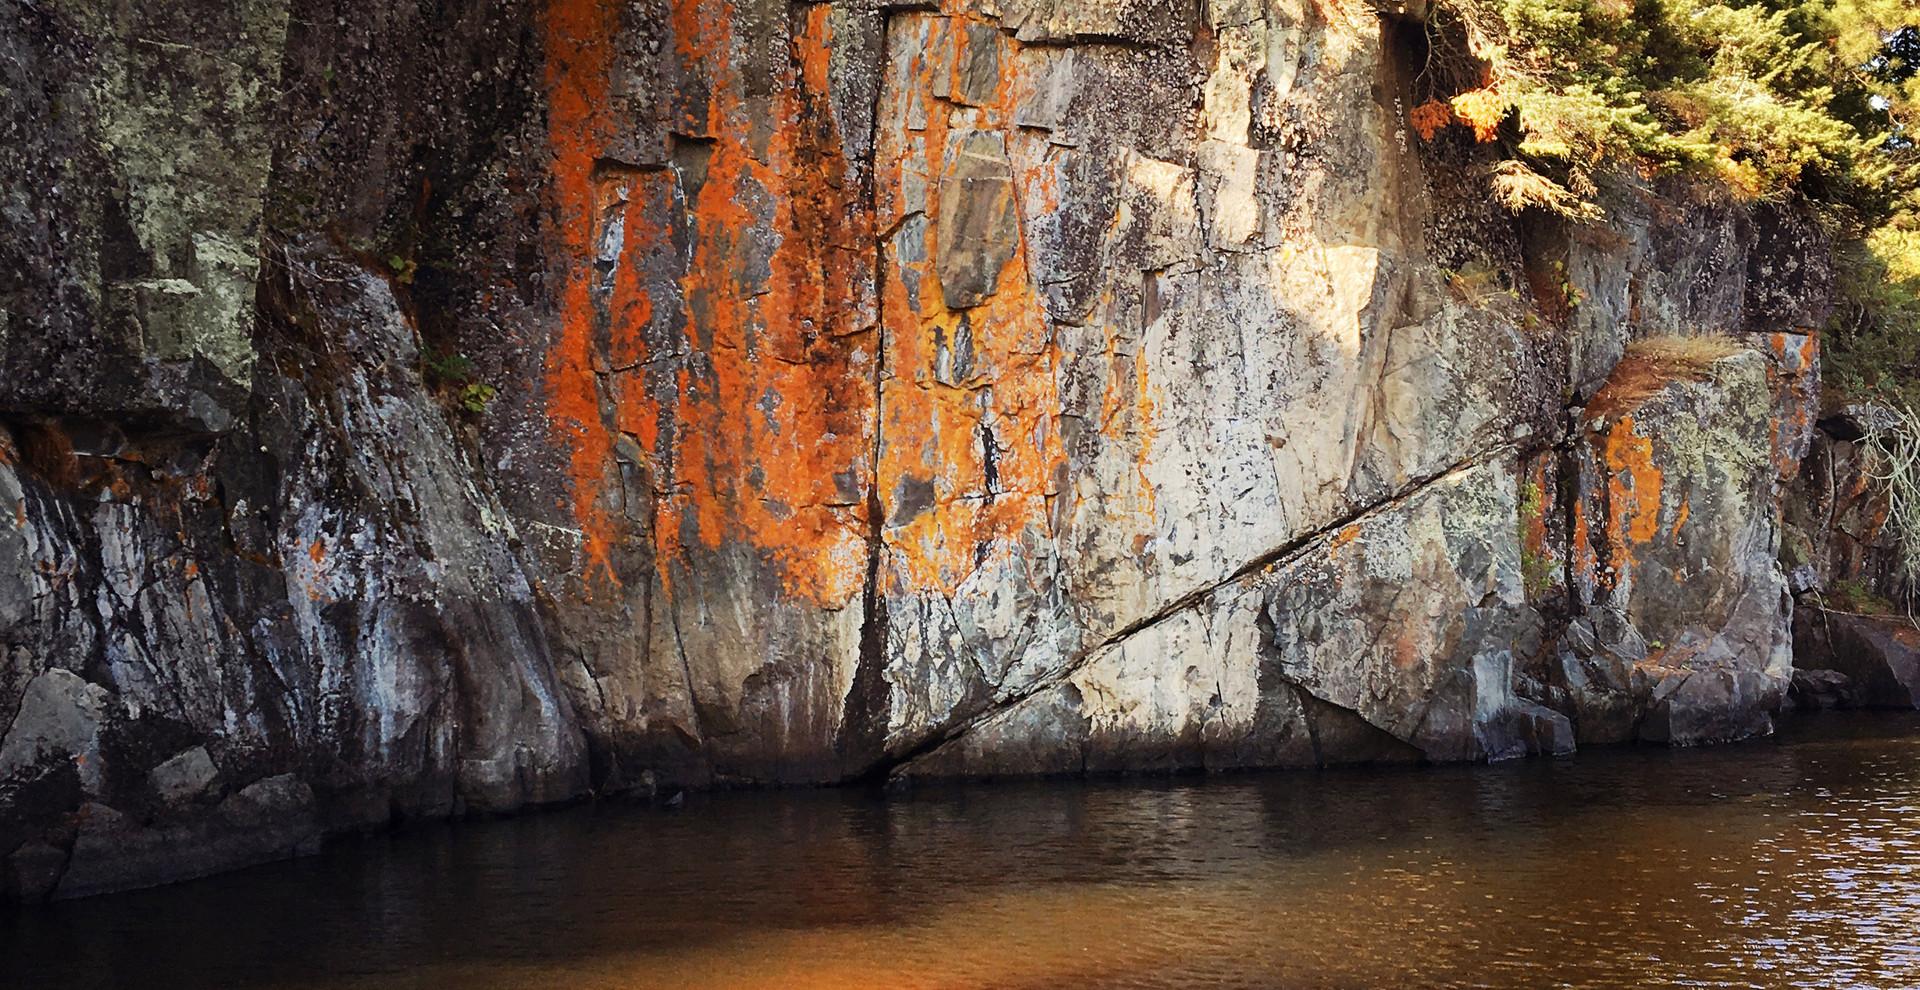 Birthplace of Ober Orange